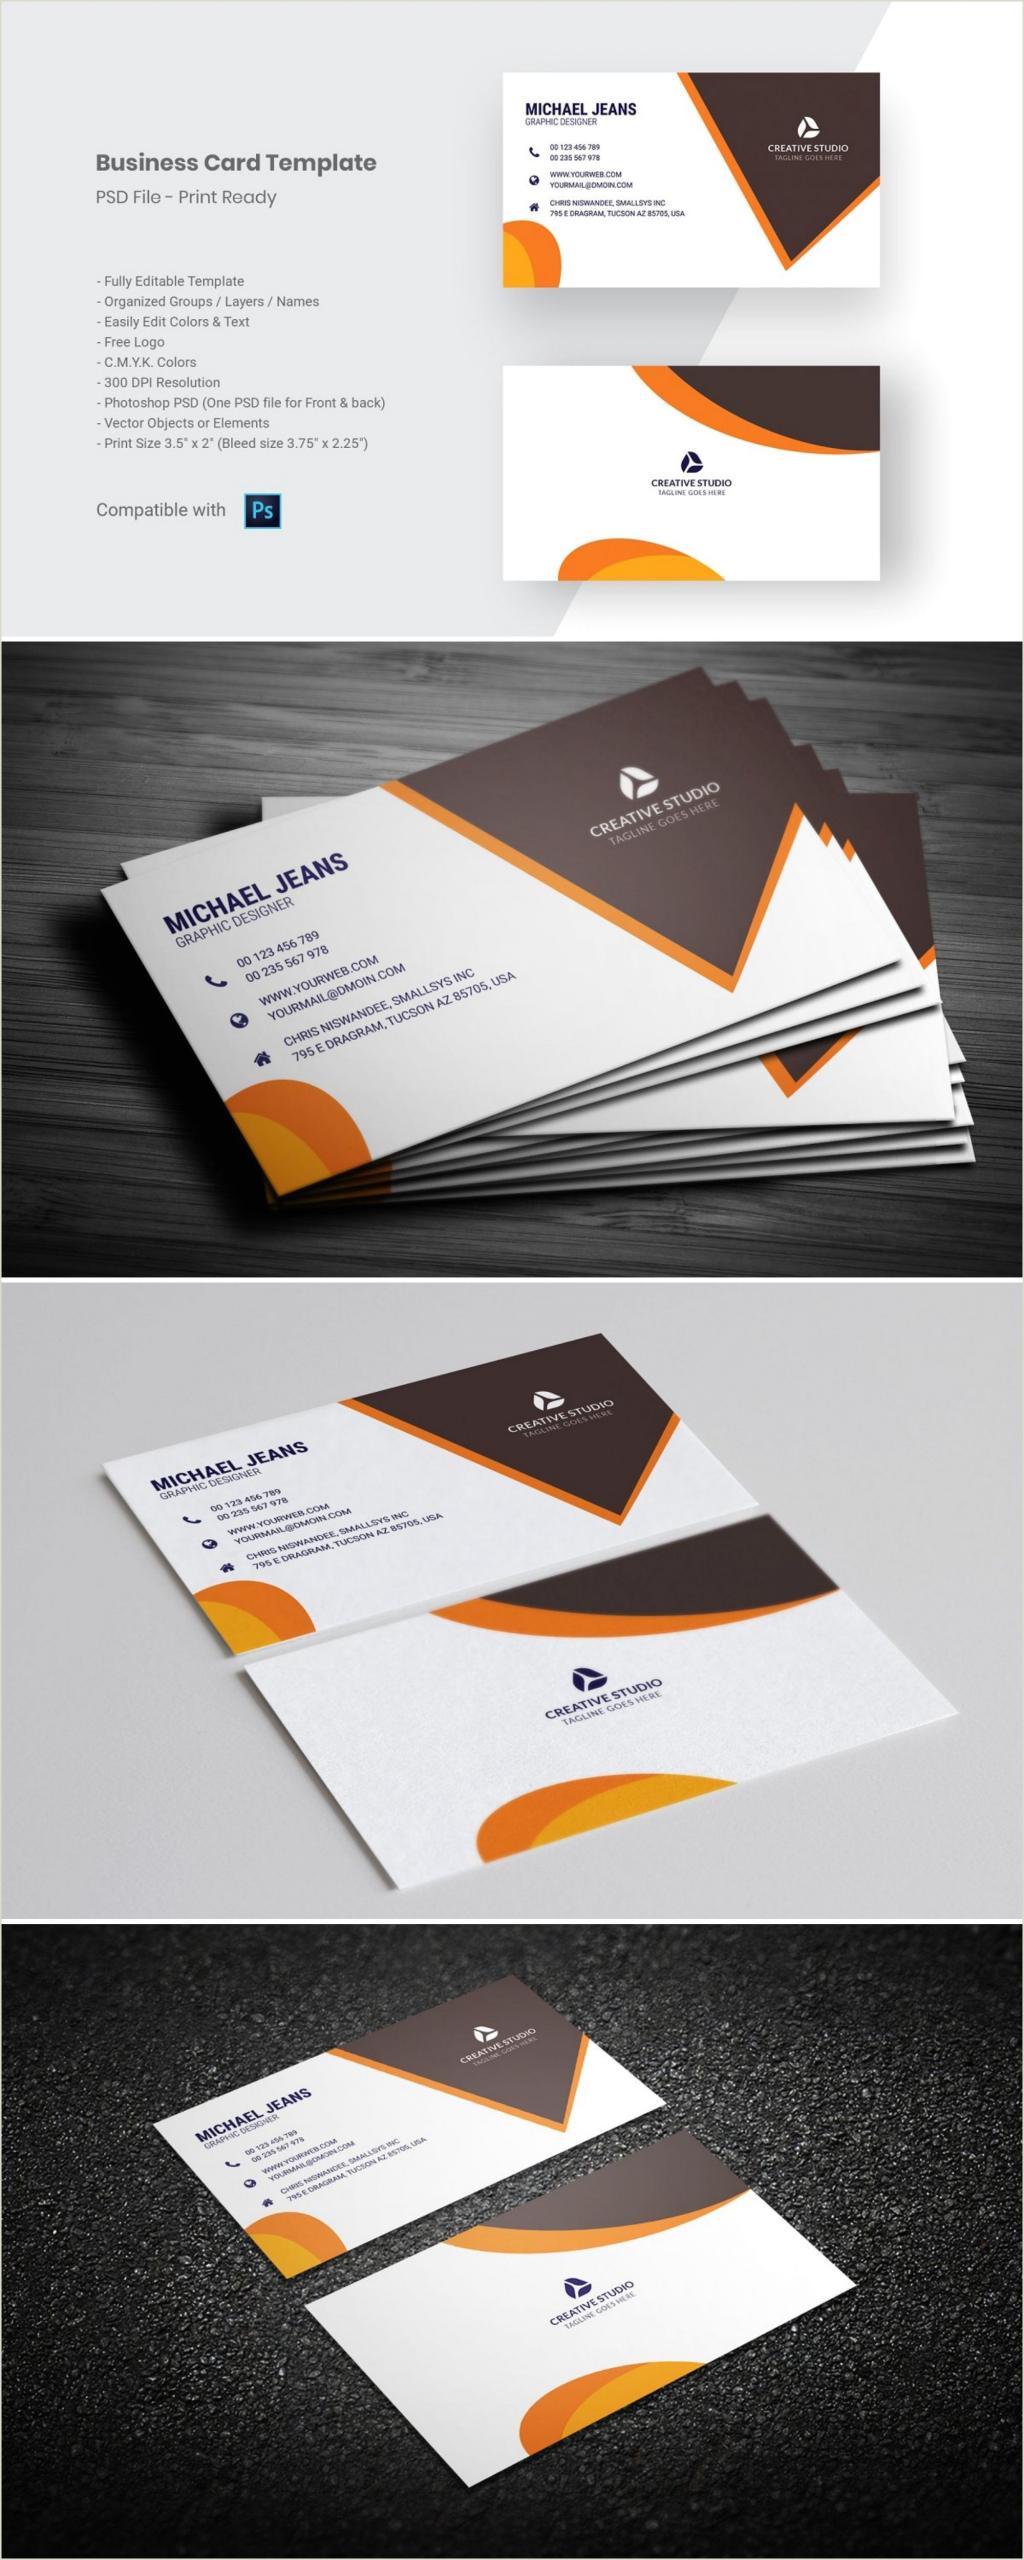 Unique Entrepreneur Business Cards Modern Business Card Template